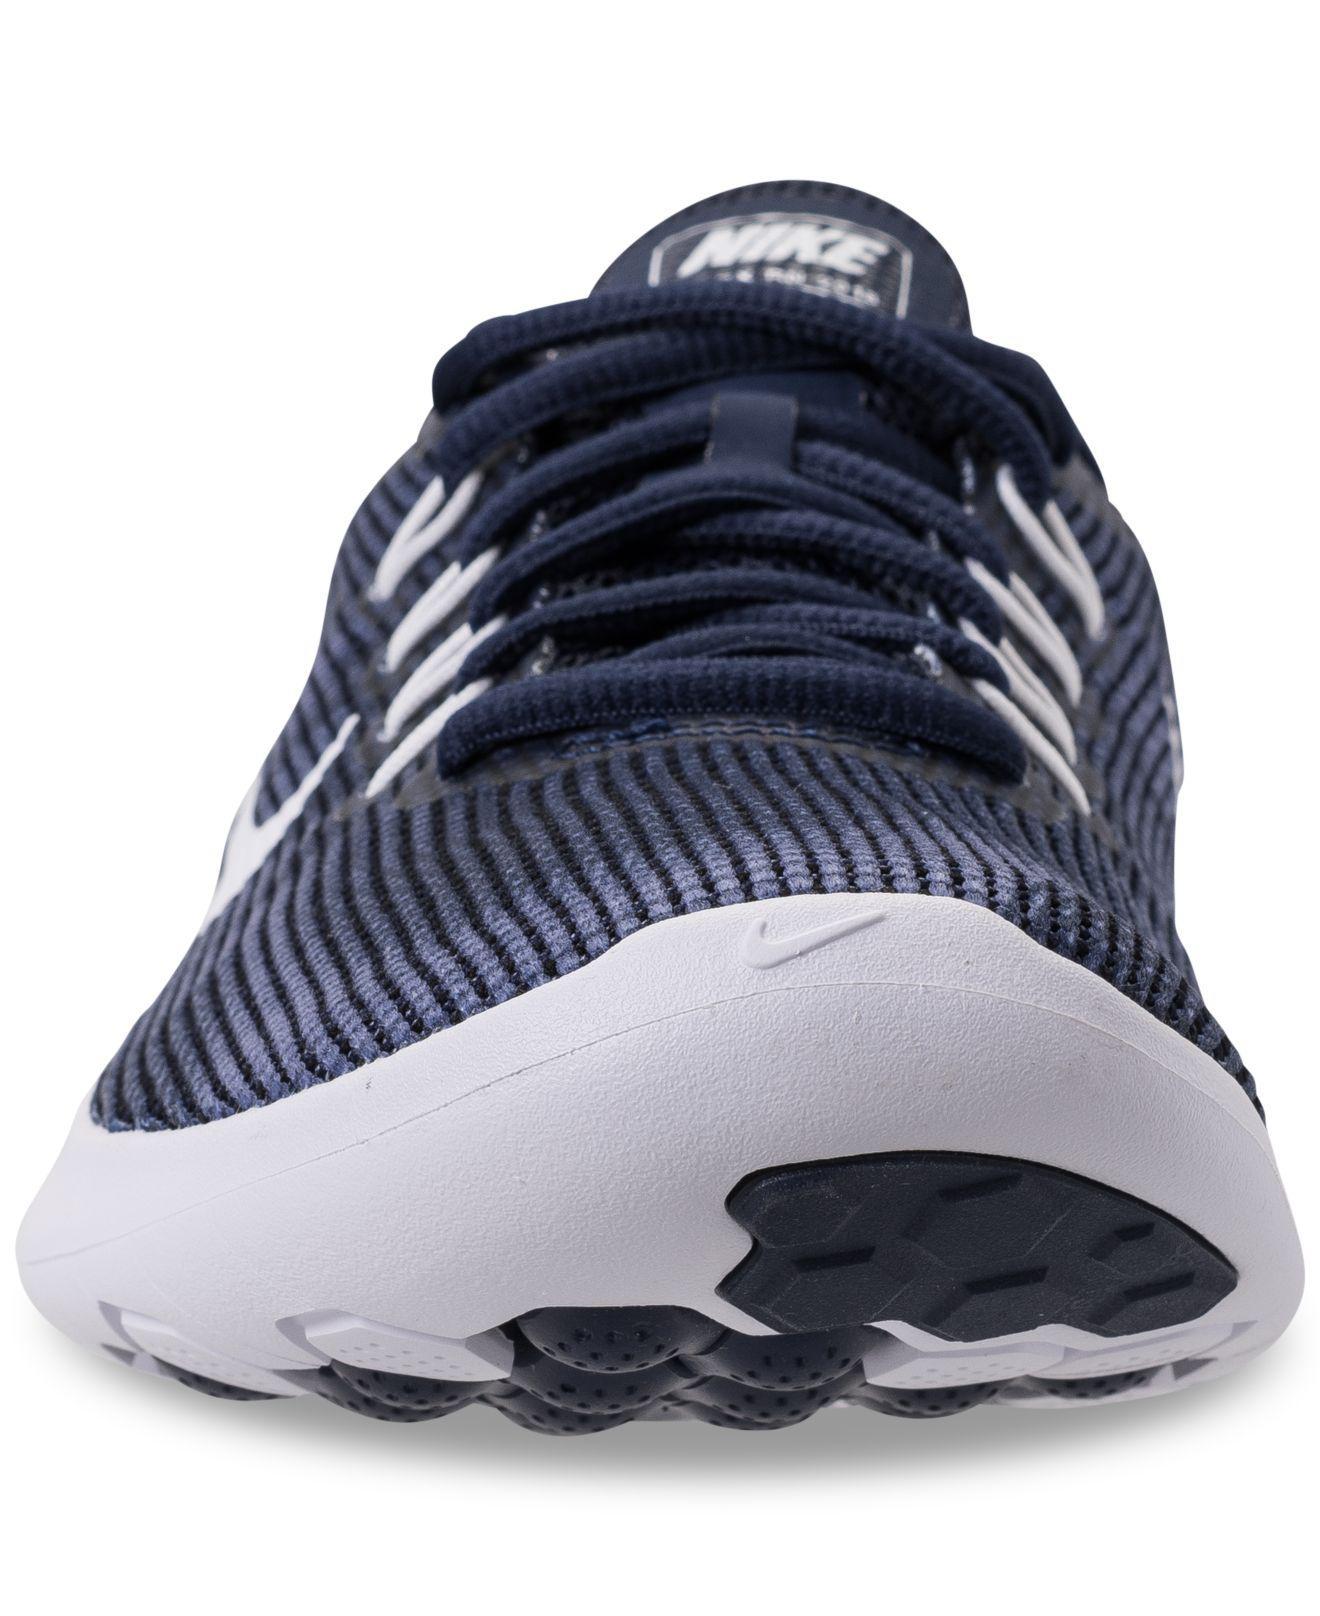 best service 57665 231e6 Nike - Blue Flex Run 2018 Running Sneakers From Finish Line for Men - Lyst.  View fullscreen